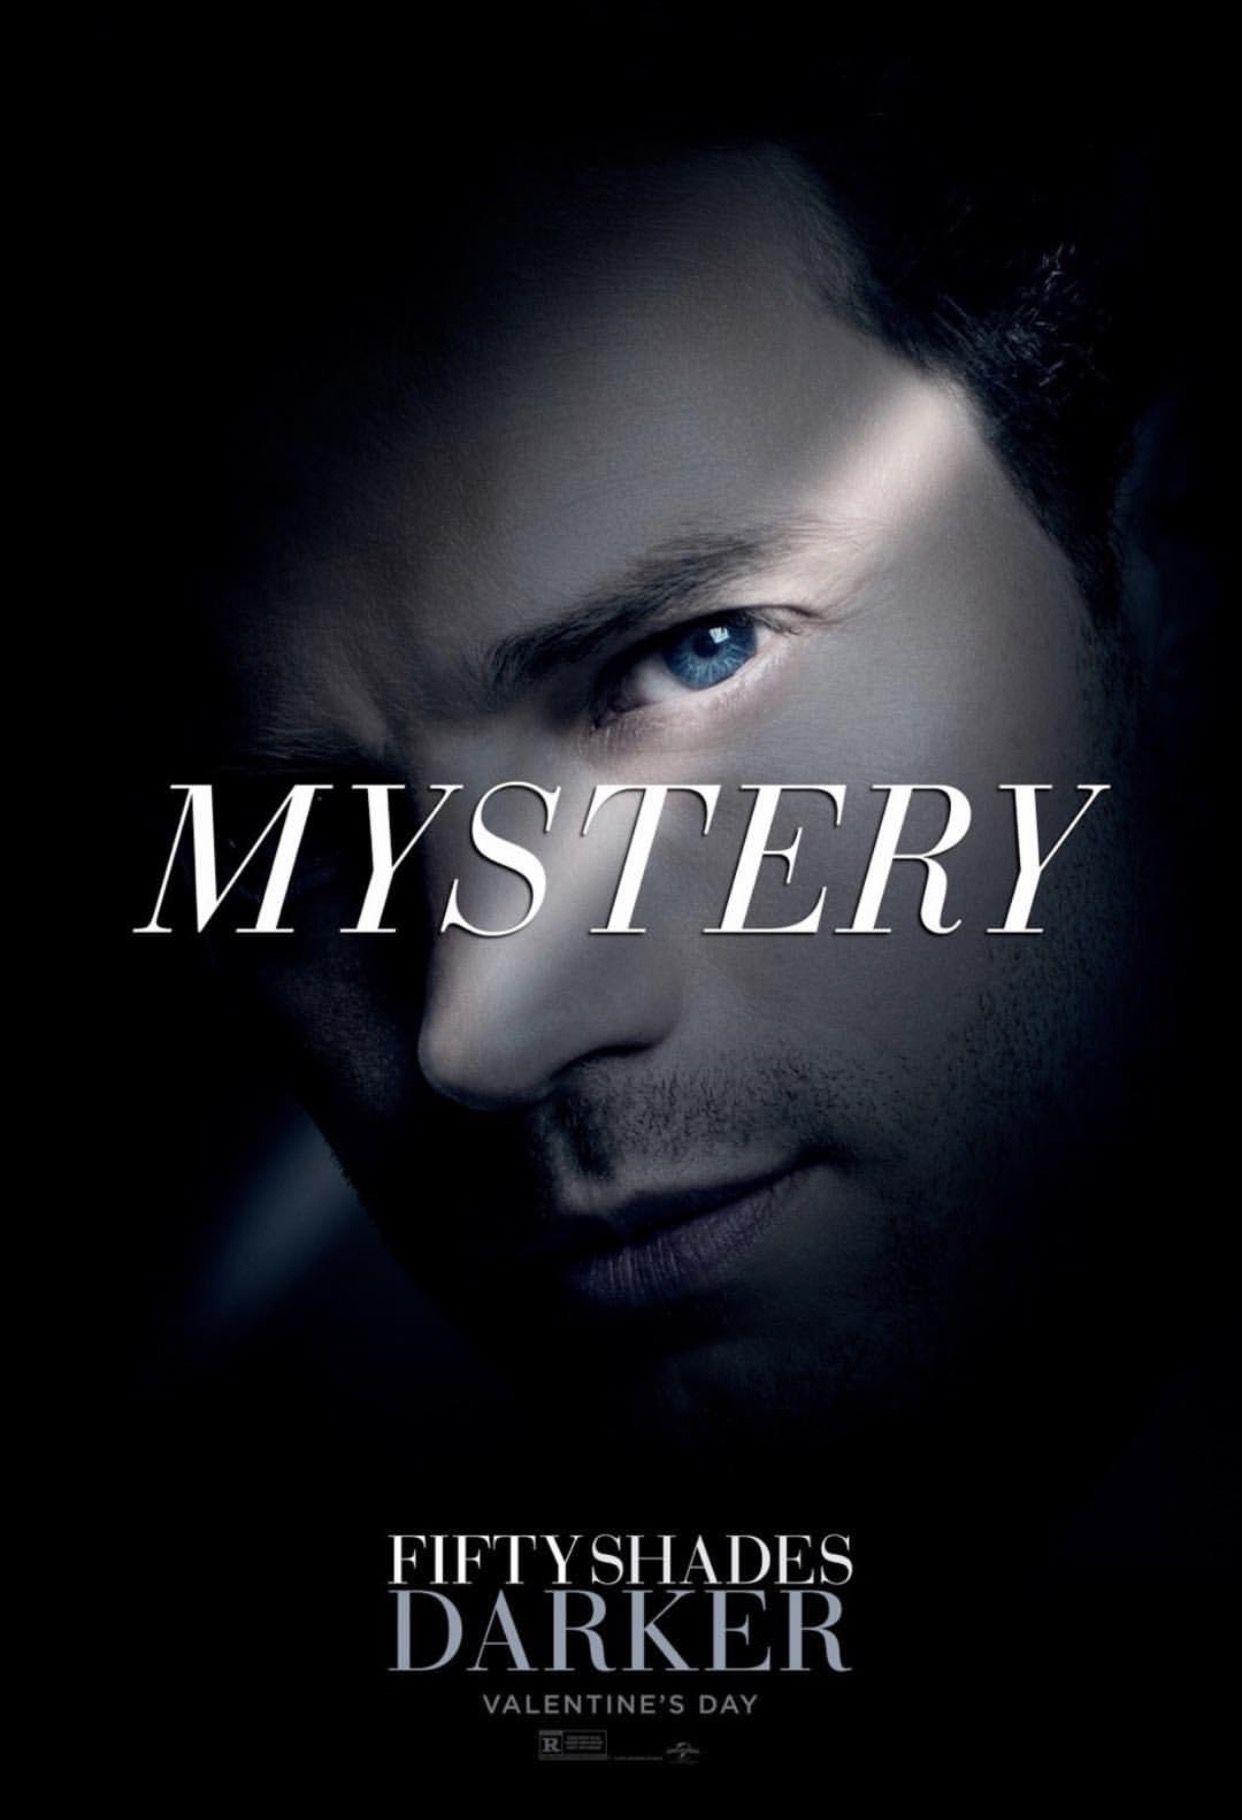 Mystery Fifty Shades Darker Fifty Shades Darker Movie Fifty Shades Fifty Shades Darker